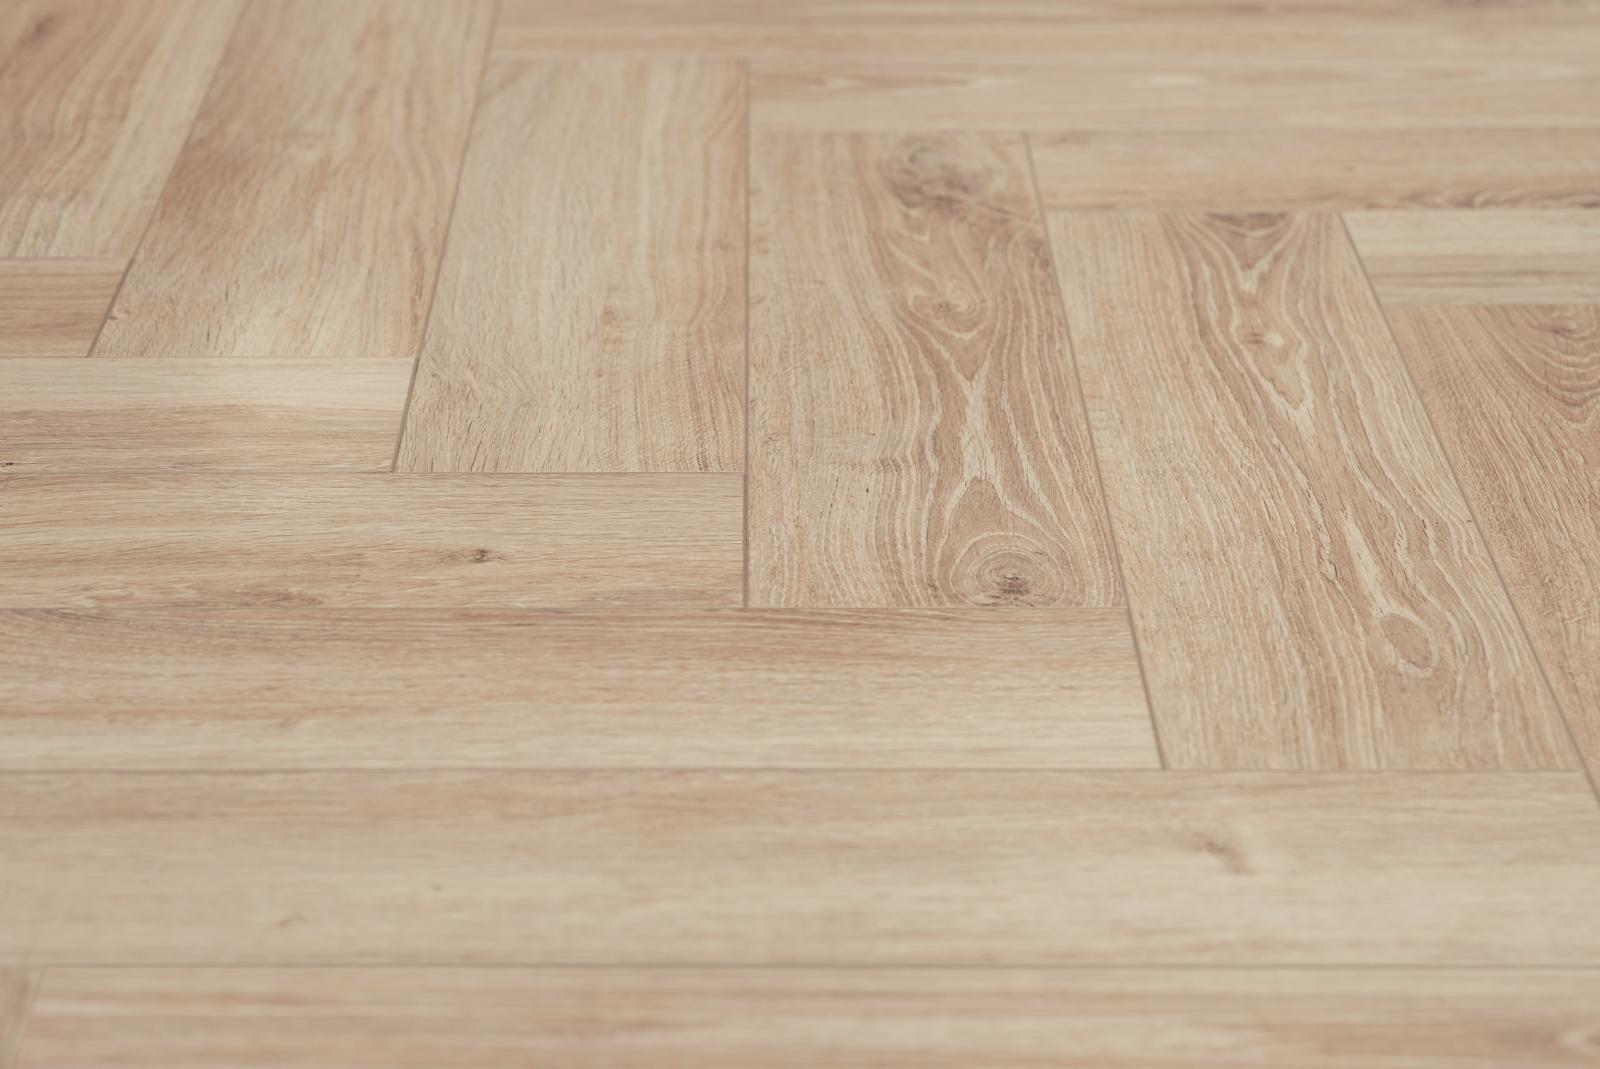 Floer visgraat laminaat vloeren mat wit eiken patroon vloer